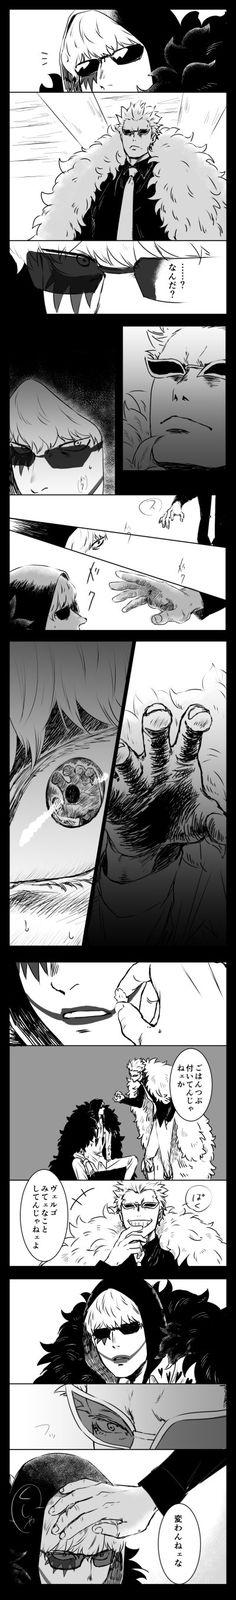 One Piece || Donquixote Doflamingo/Joker || Donquixote Rocinante/Corazon